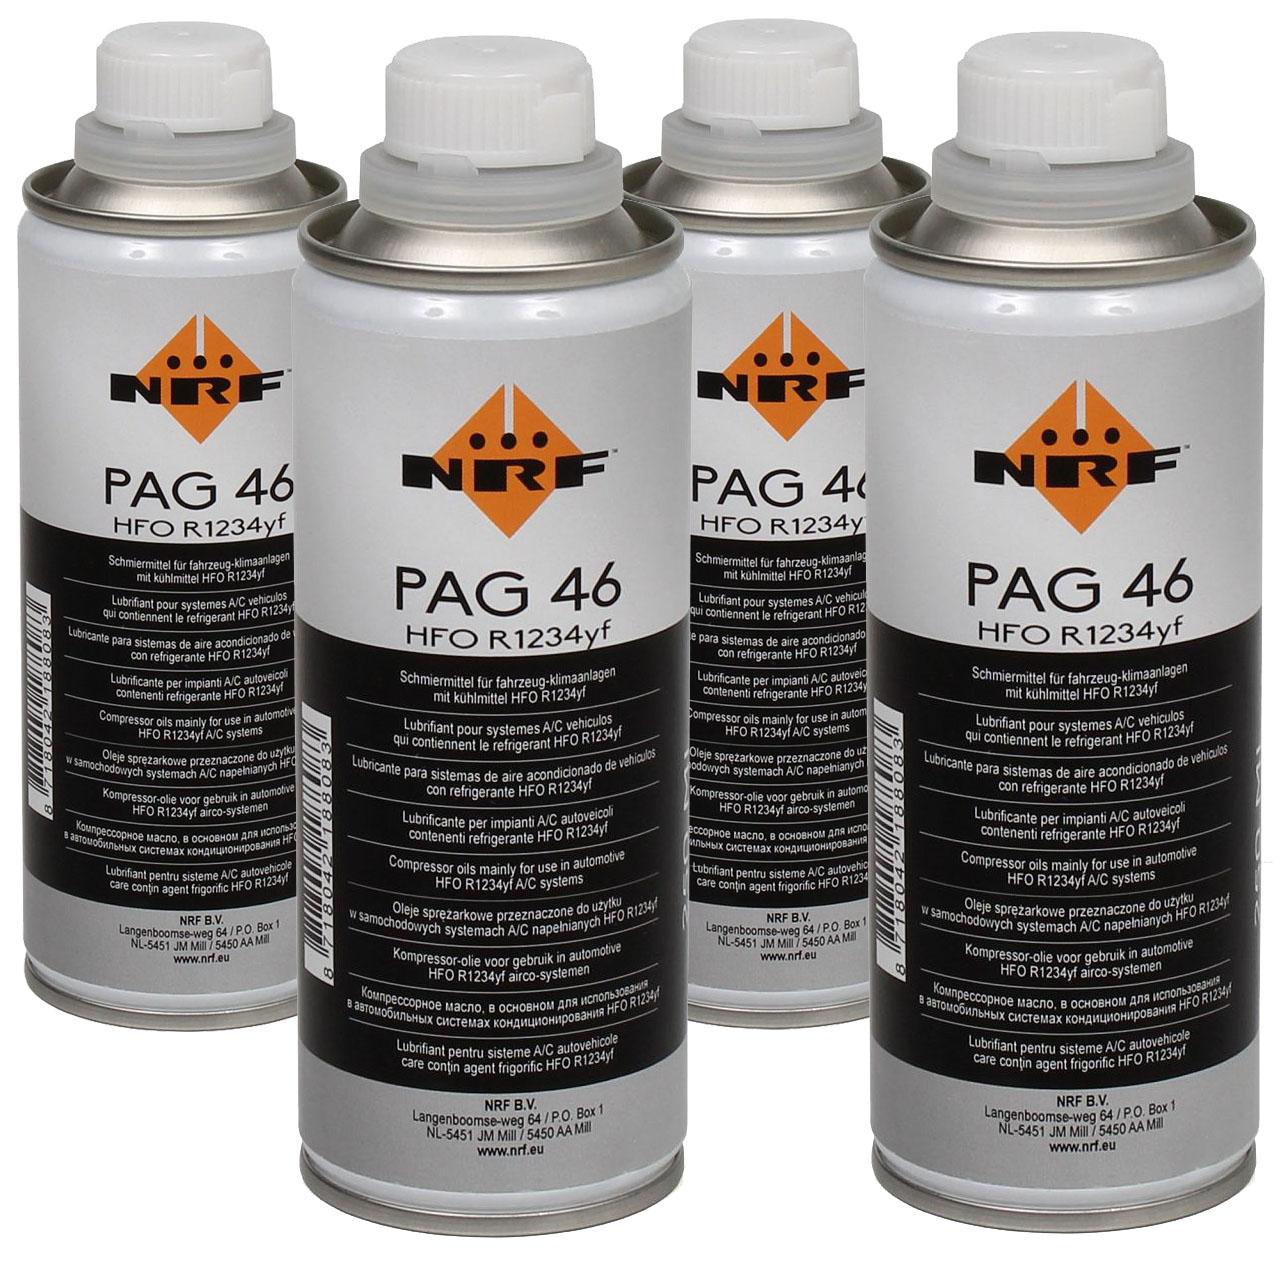 NRF 38837 Kompressor Öl Kompressoröl Klimaanlagenöl PAG 46 HFO R1234yf 1000ml